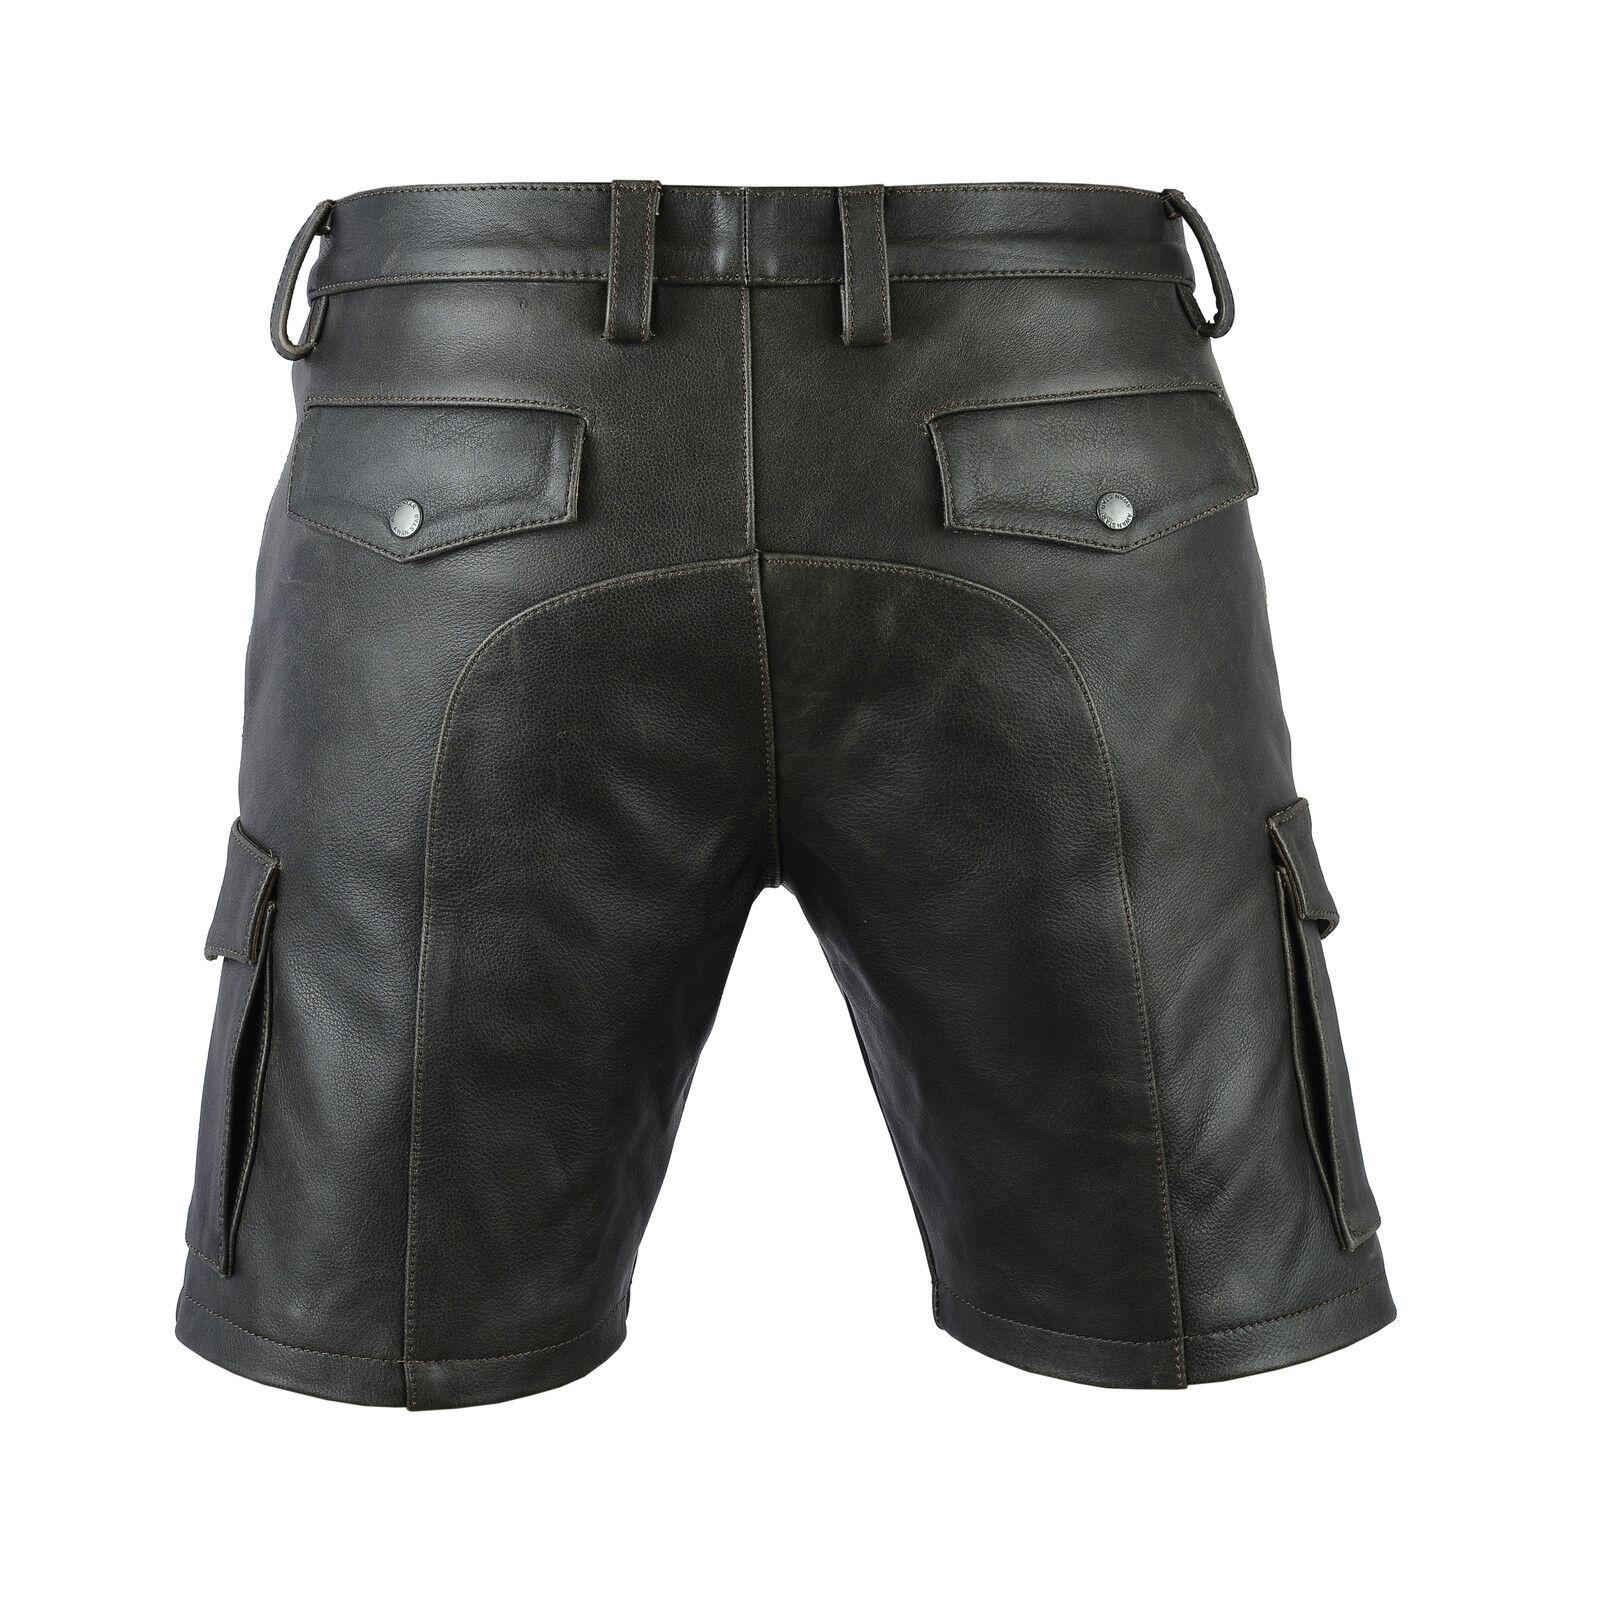 Awanstar Cargo leder shorts Ledershorts Farbe Antik,Leder Antik,Leder Antik,Leder Shorts,kurze lederhose | Trendy  0b70e0